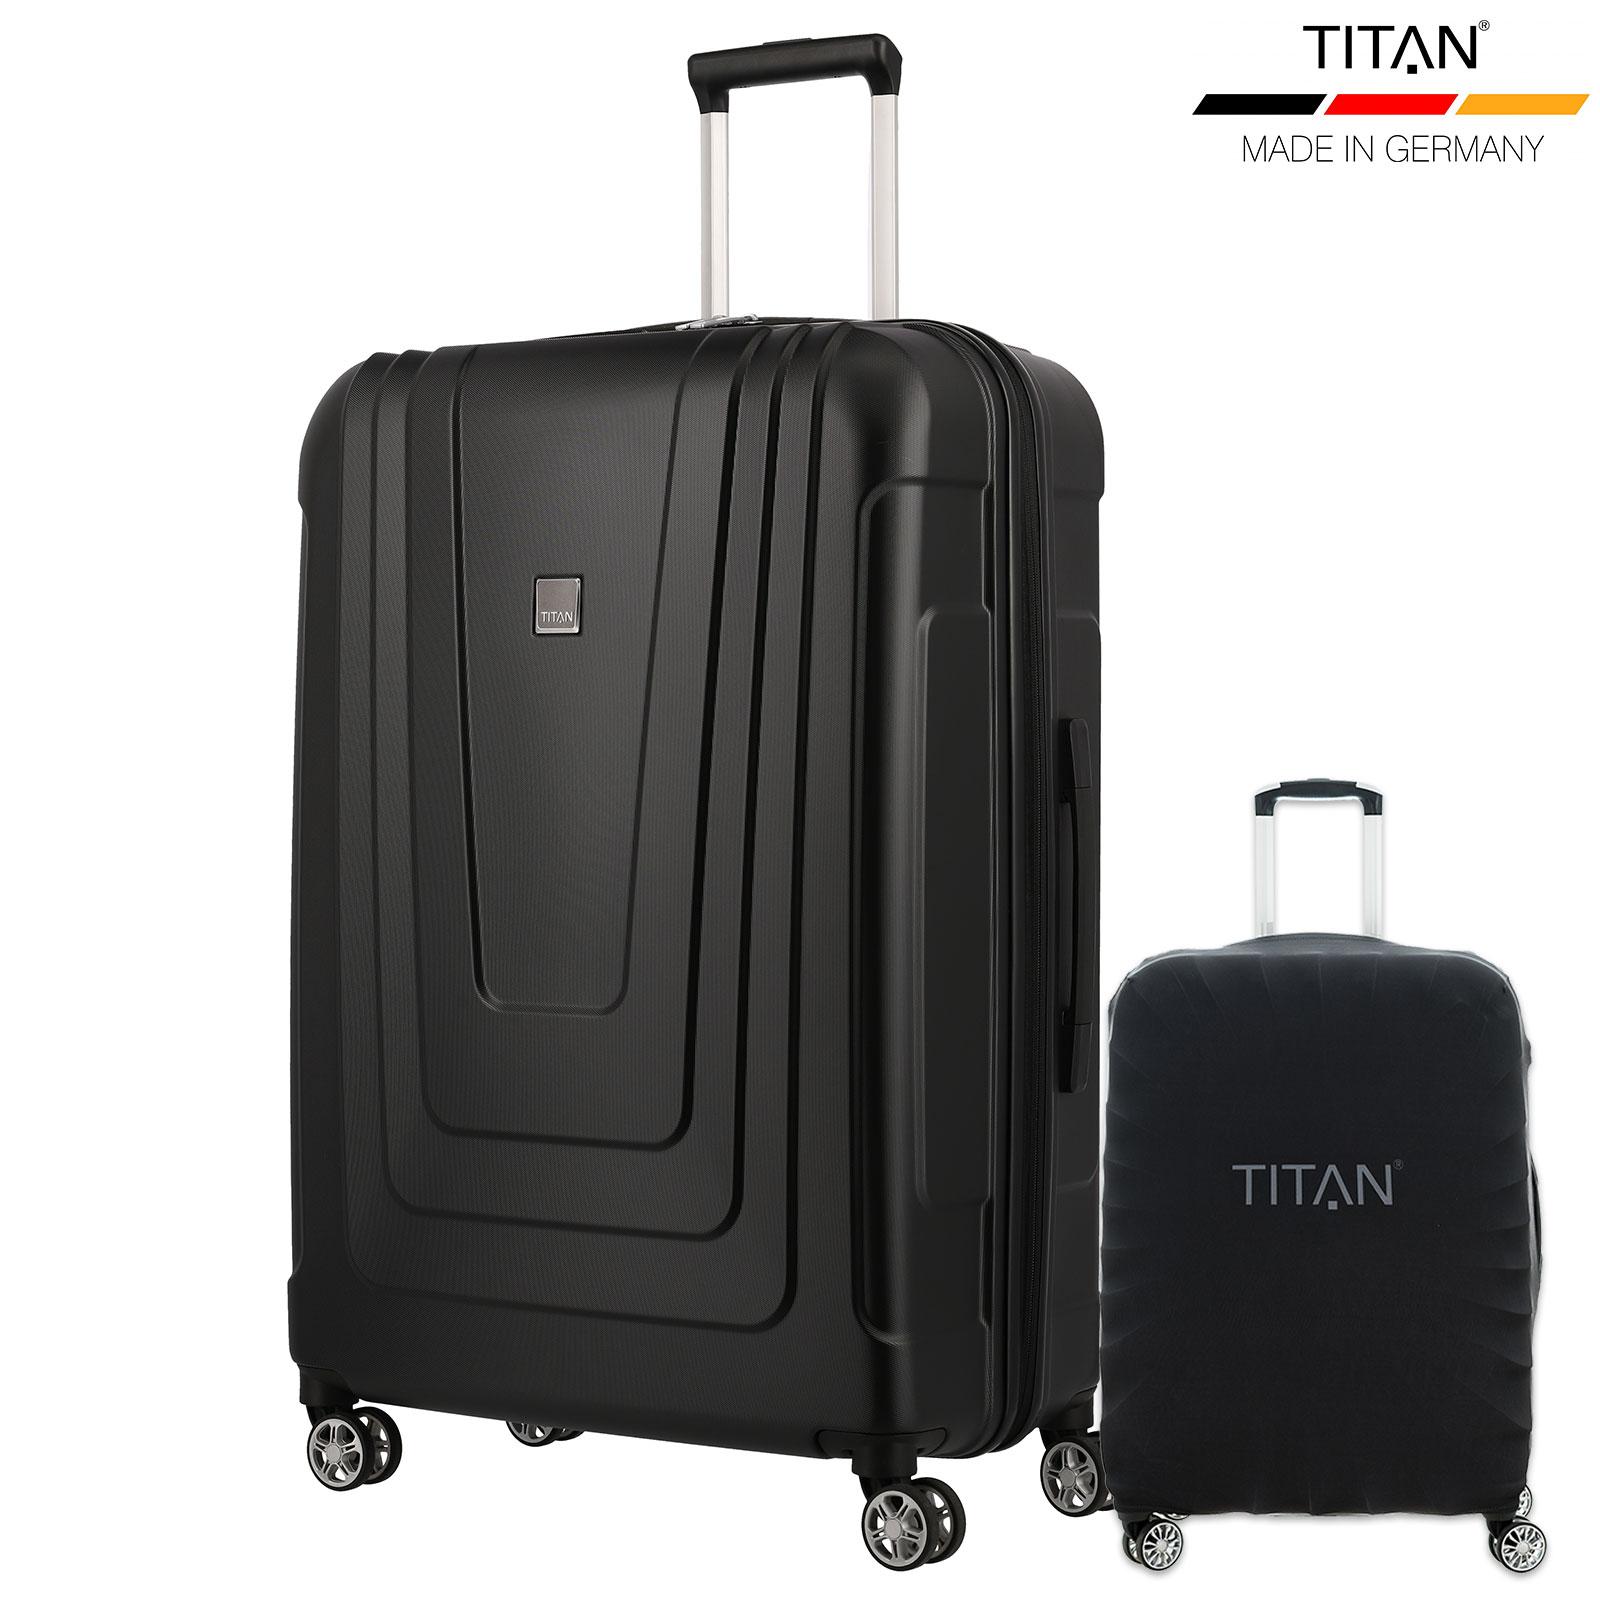 TITAN X-RAY 77cm Trolley Atomic Black inkl. Kofferschutz